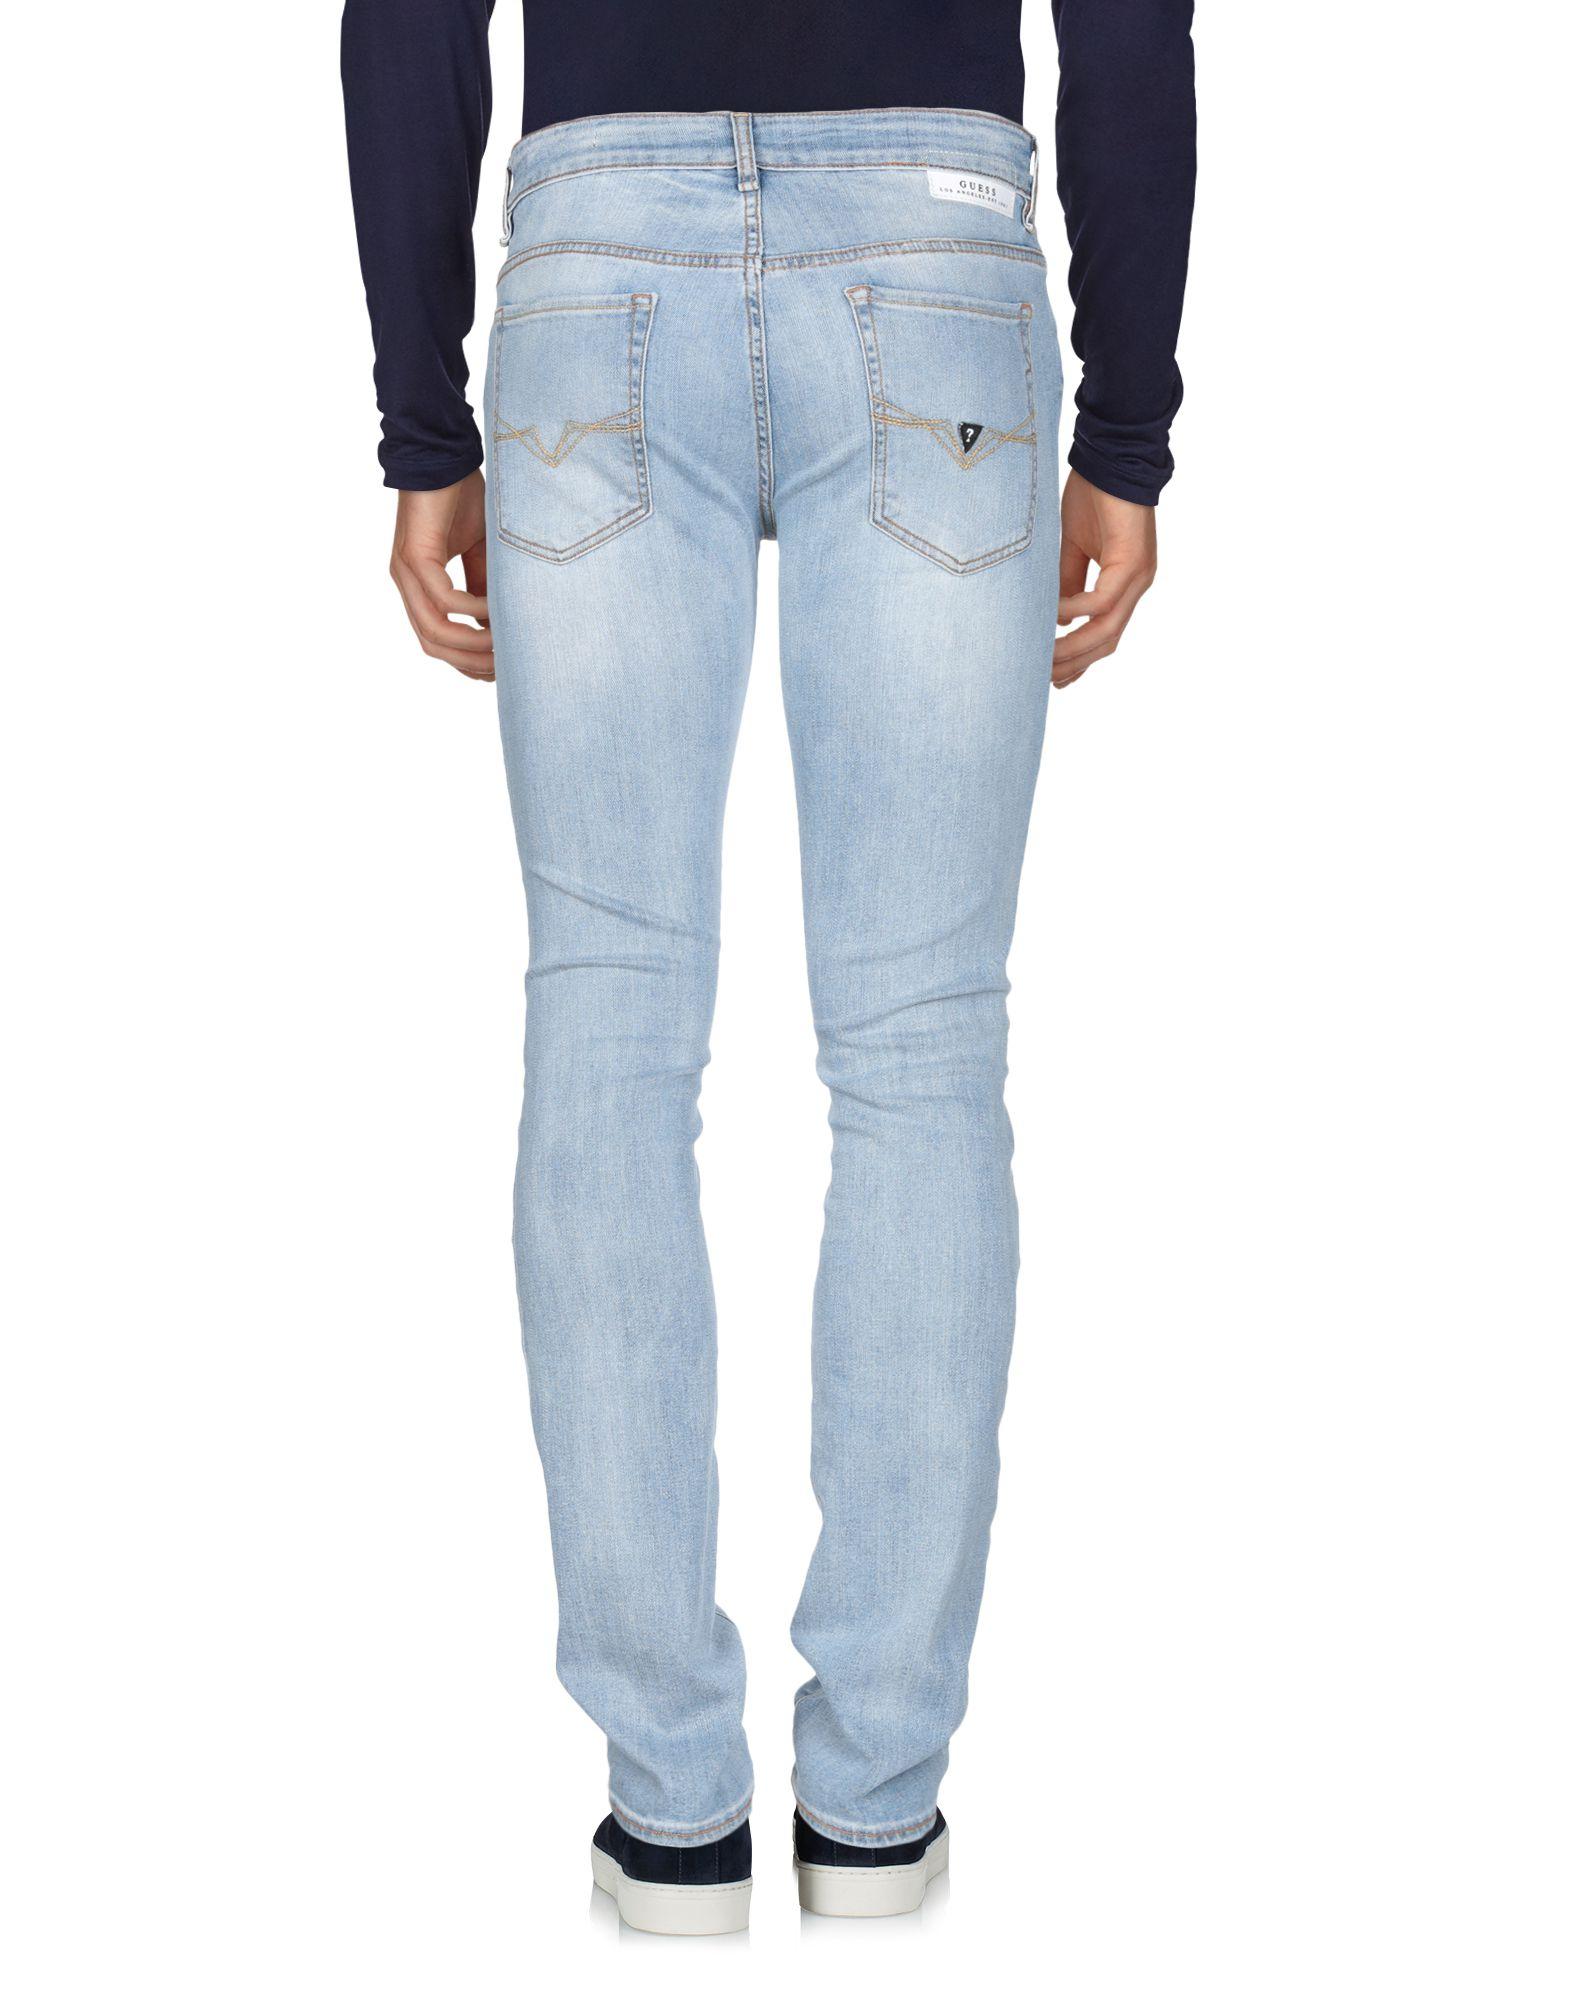 Pantaloni Jeans Guess - Uomo - Guess 42687619NV 187437